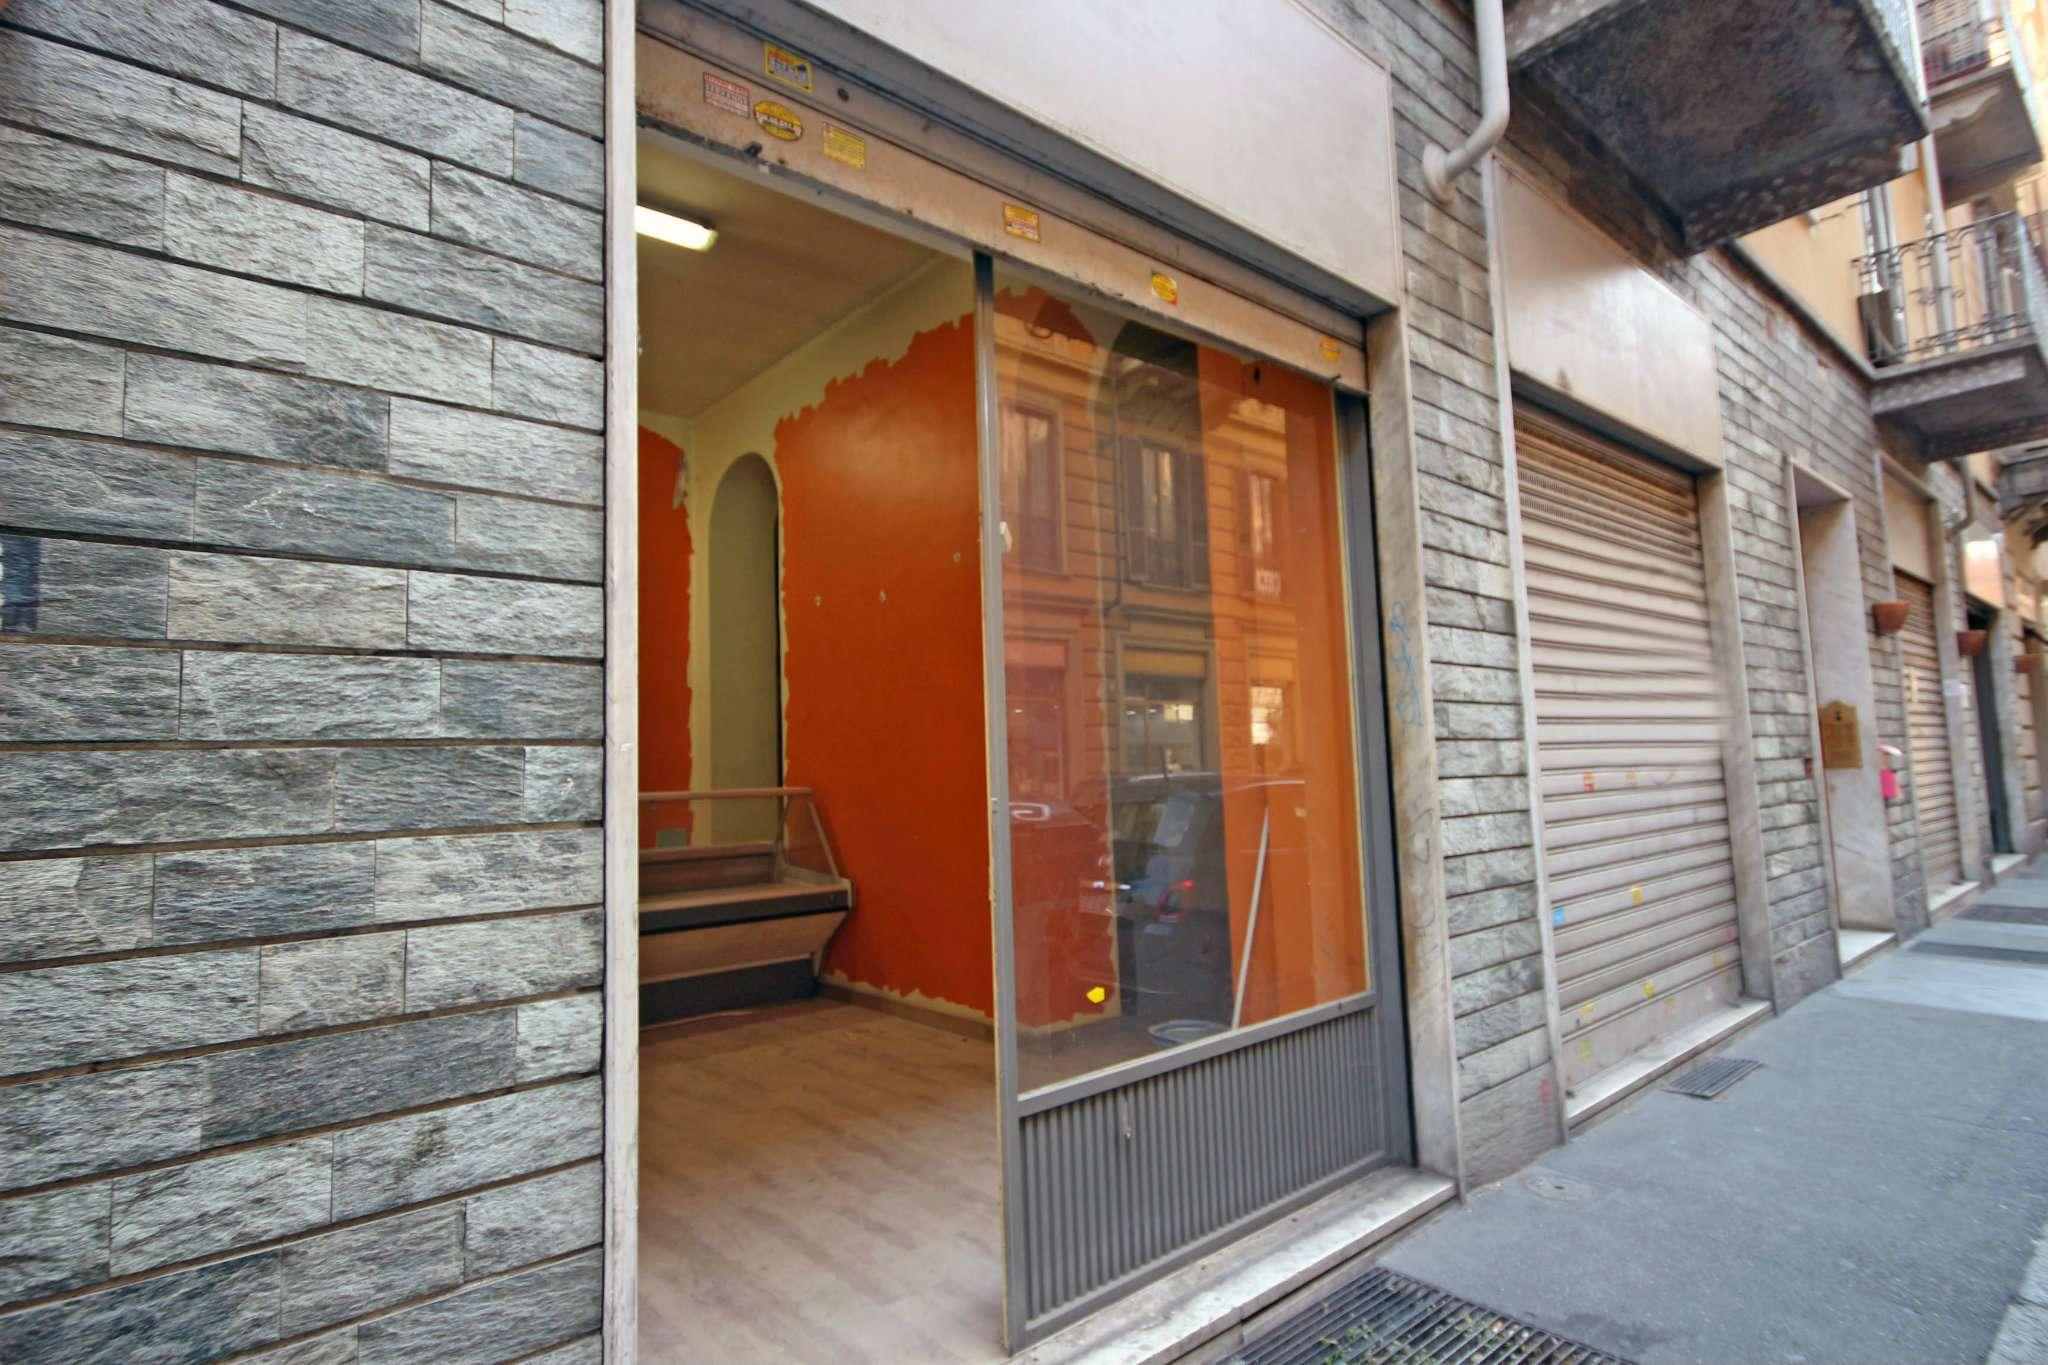 Negozio in vendita Zona San Salvario - via Saluzzo Torino